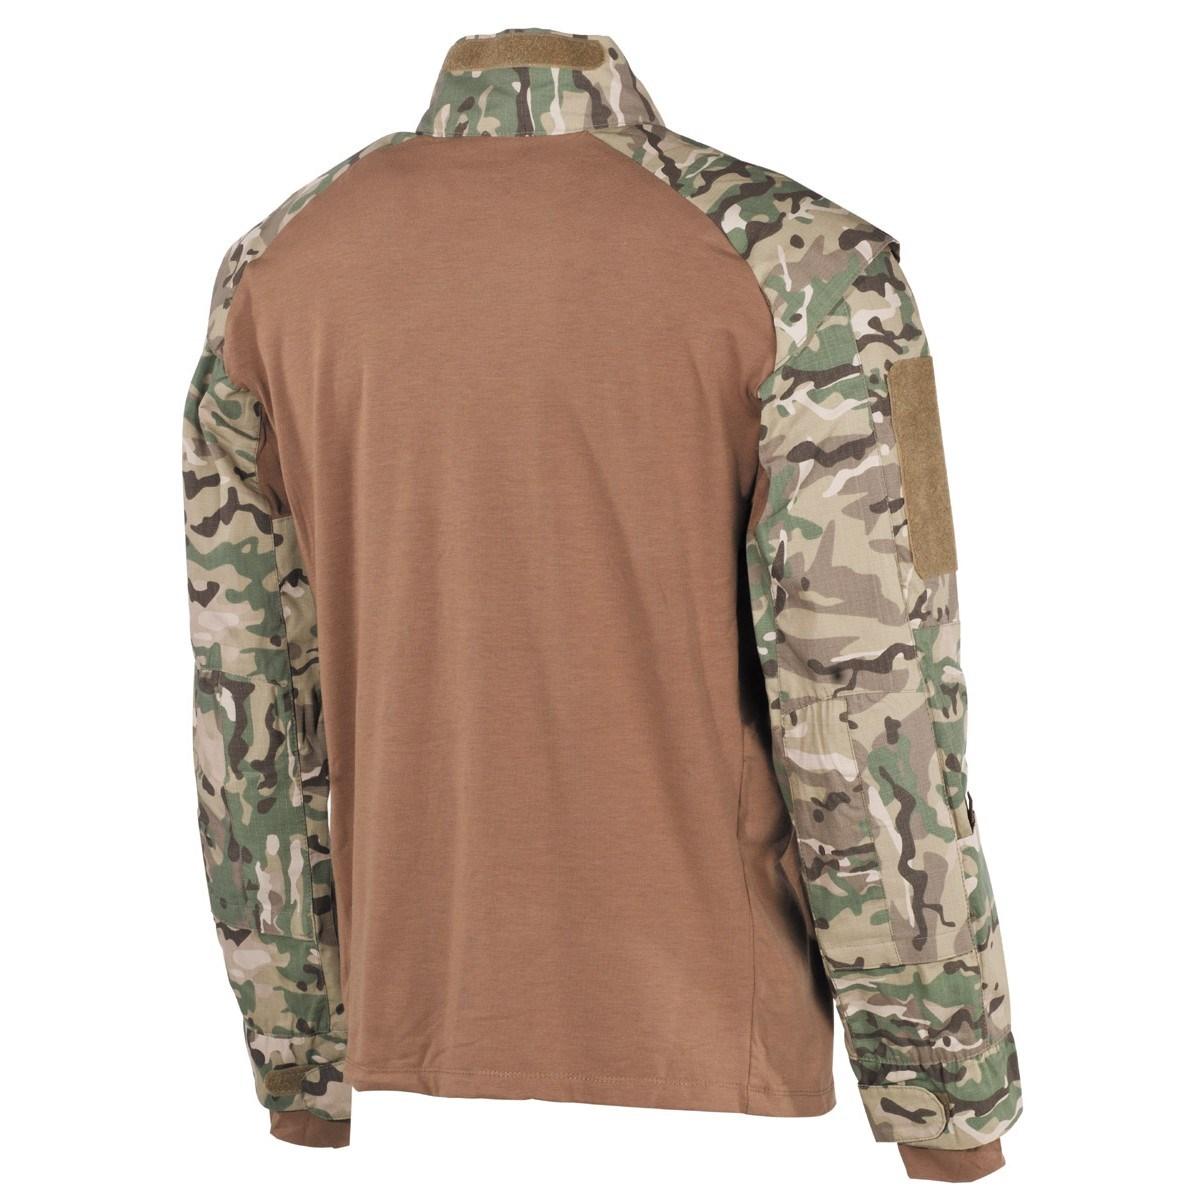 Košile taktická UBACS OPERATION CAMO MFH Defence 02611X L-11